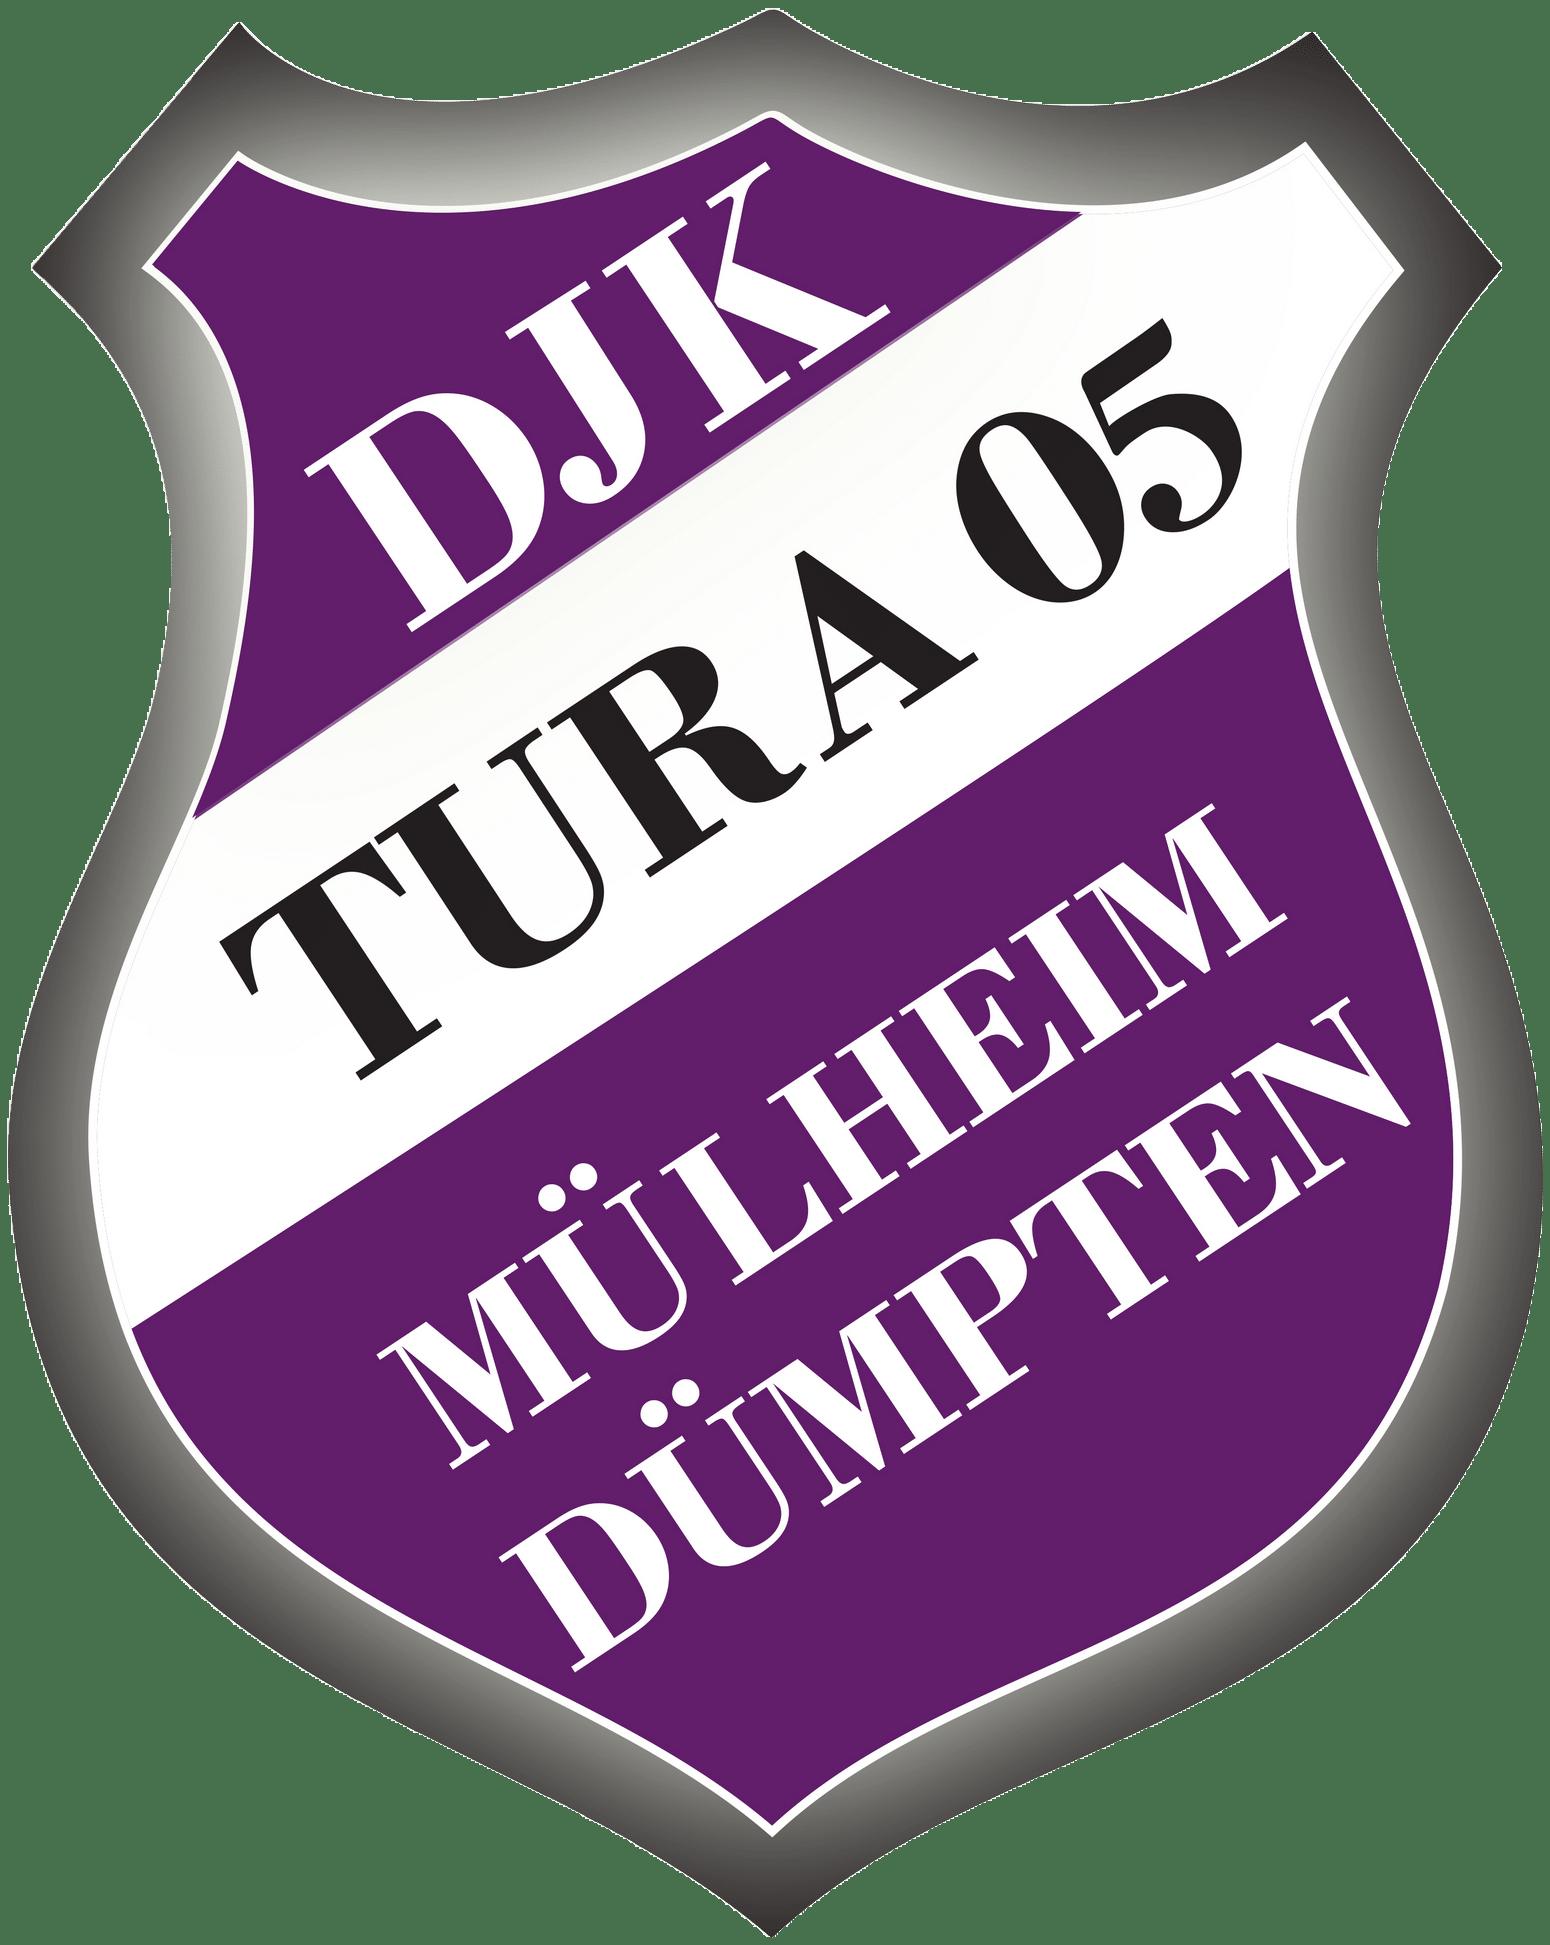 DJK Tura05 Dümpten e.V.